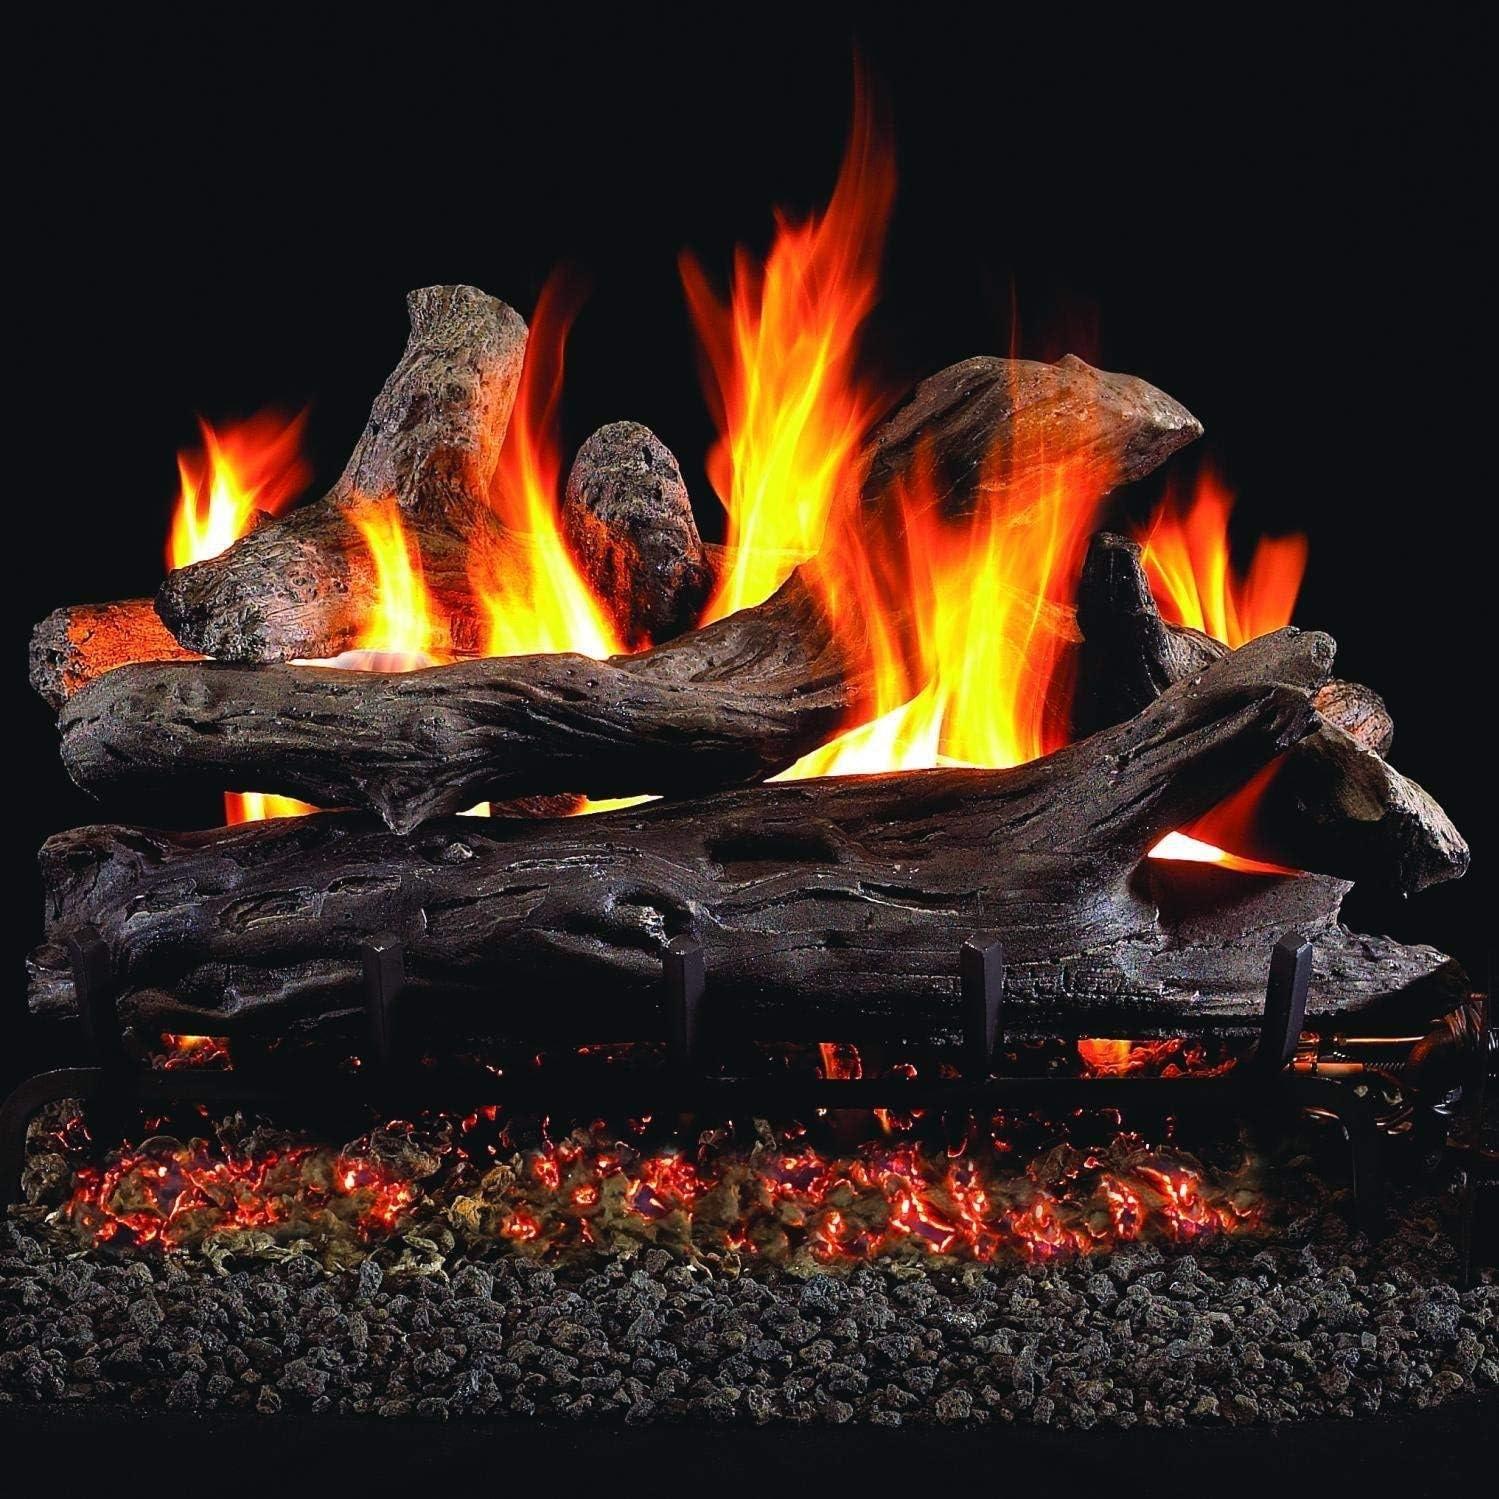 gasthof donau sigmaringen.de Home & Kitchen Stove & Fireplace ...